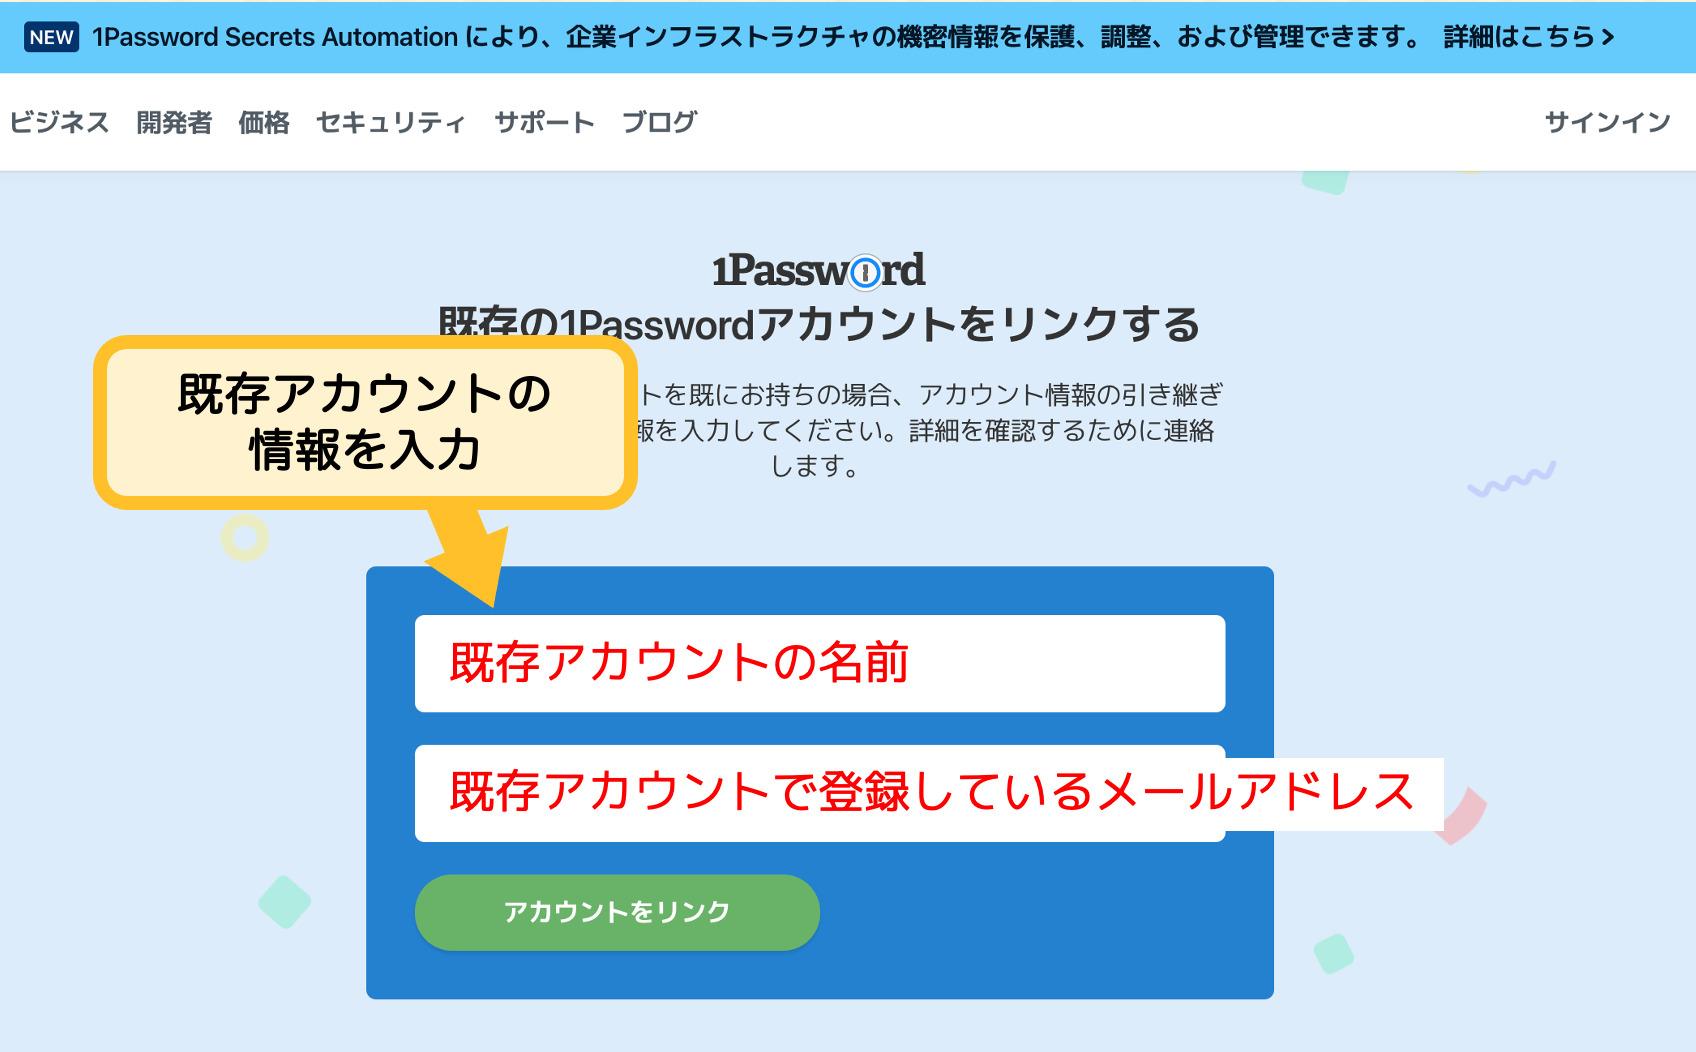 1passwordリンク画面6